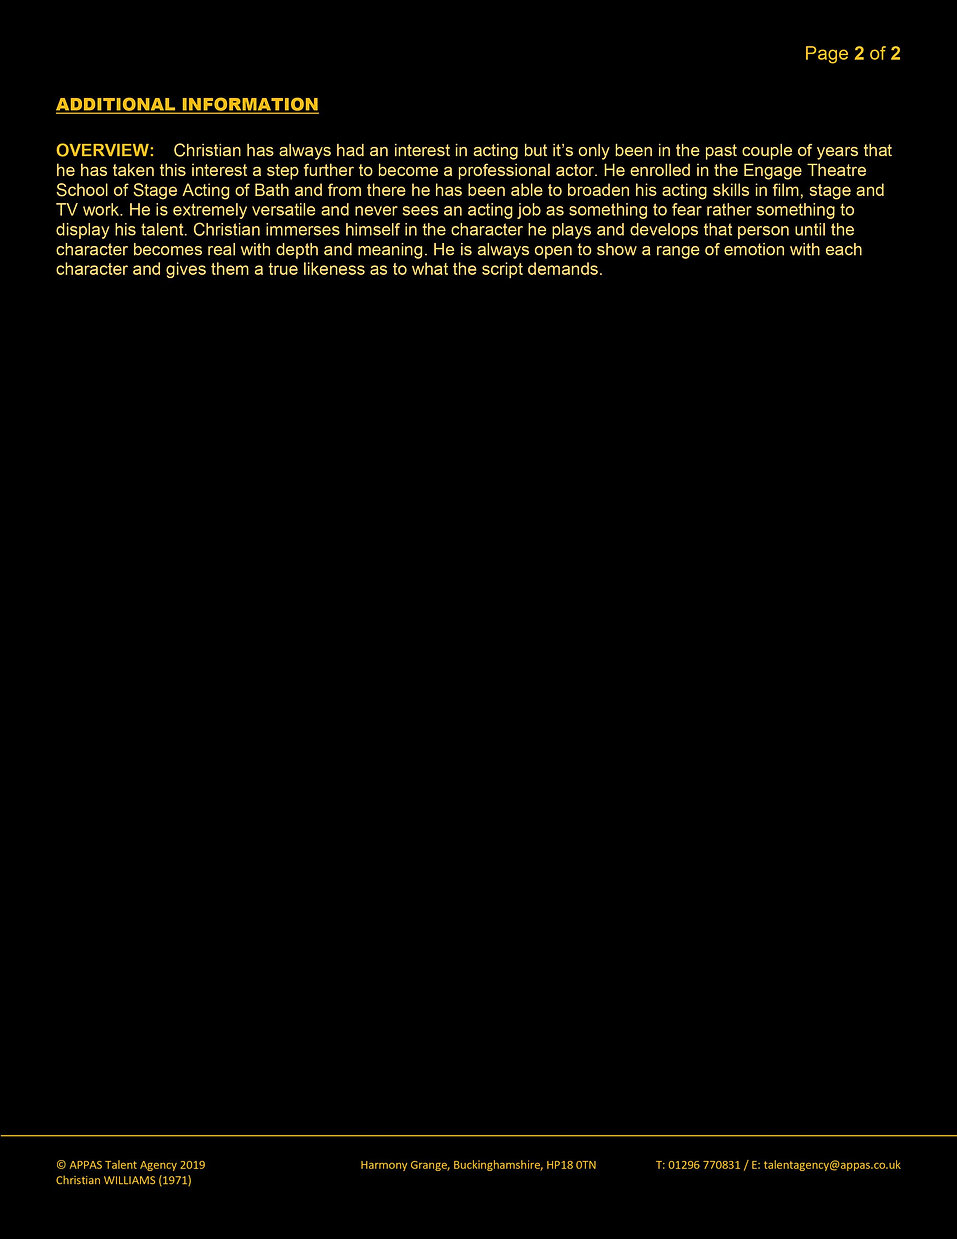 CHRISTIAN WILLIAMS WEB CV (MAY 2020) 2.j